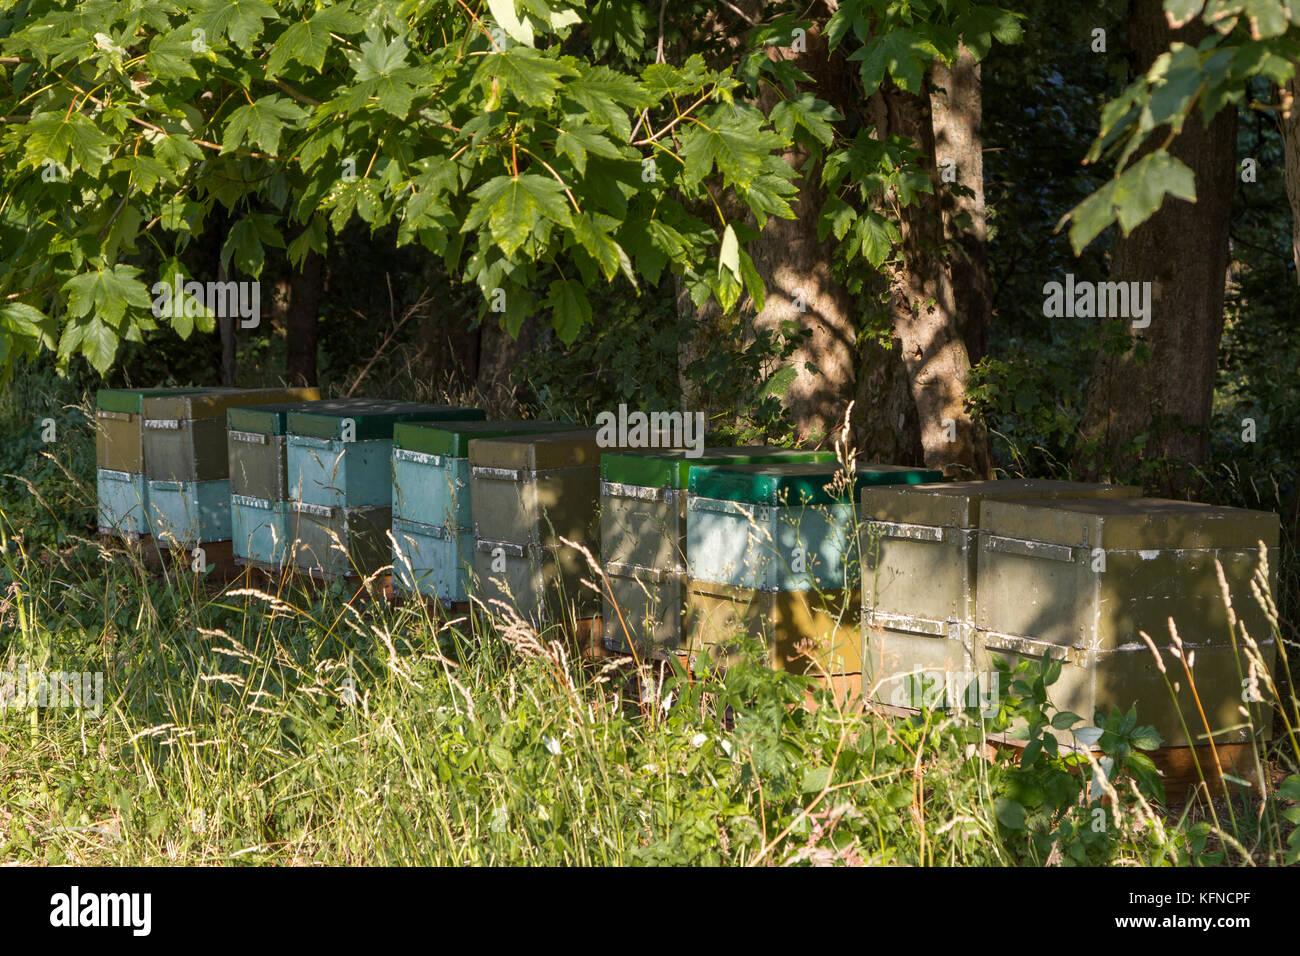 Bienenstock am Waldrand - Stock Image